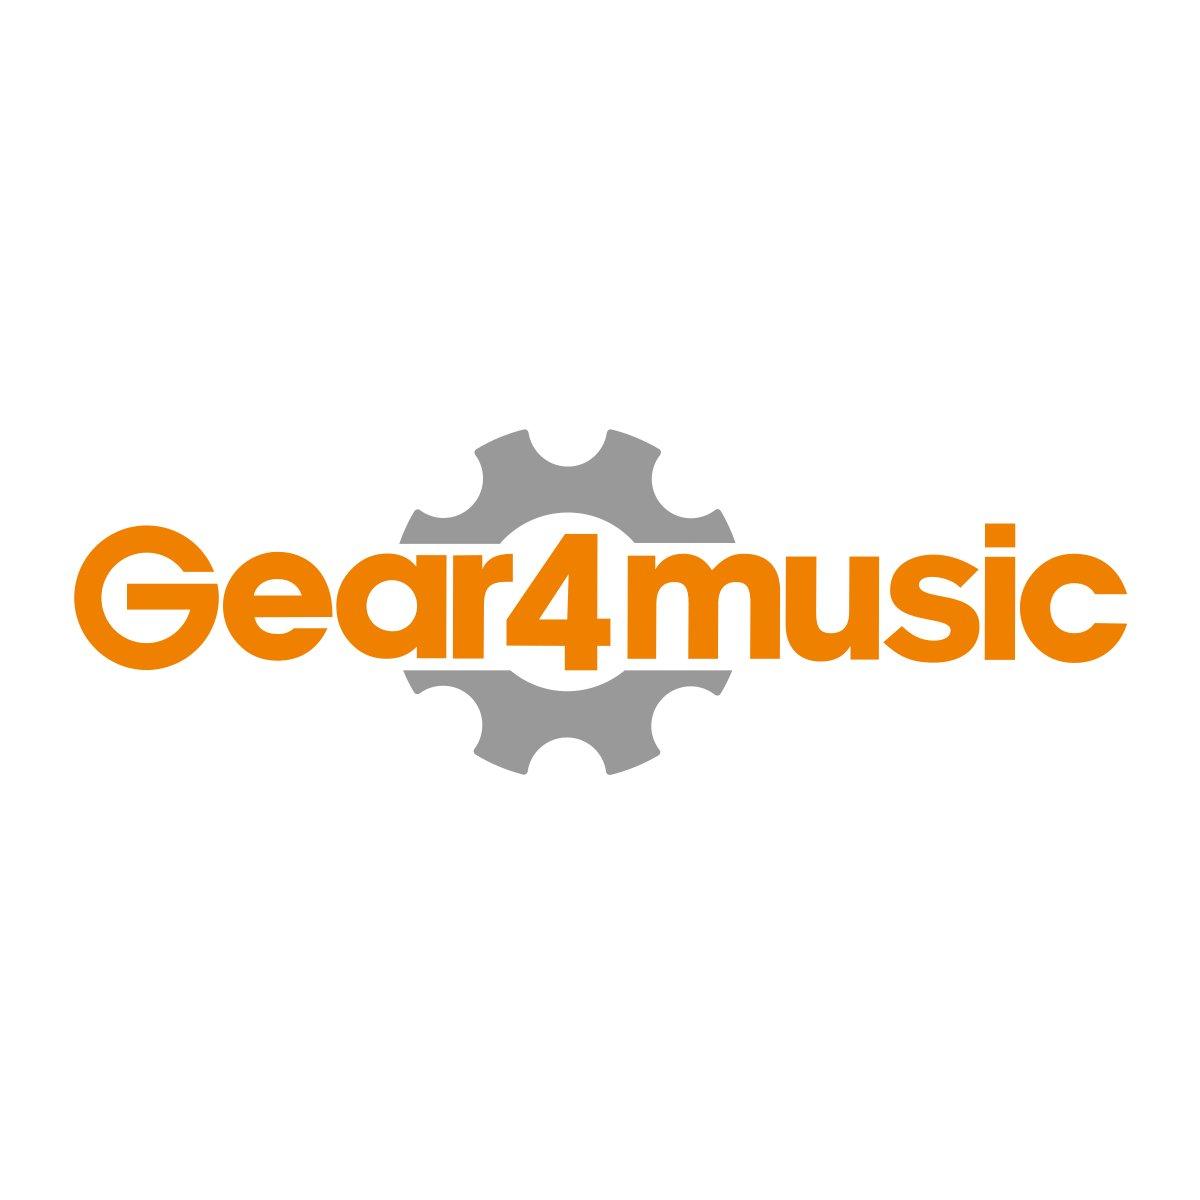 disc evh 5150 iii 100w head ivory at gear4music. Black Bedroom Furniture Sets. Home Design Ideas